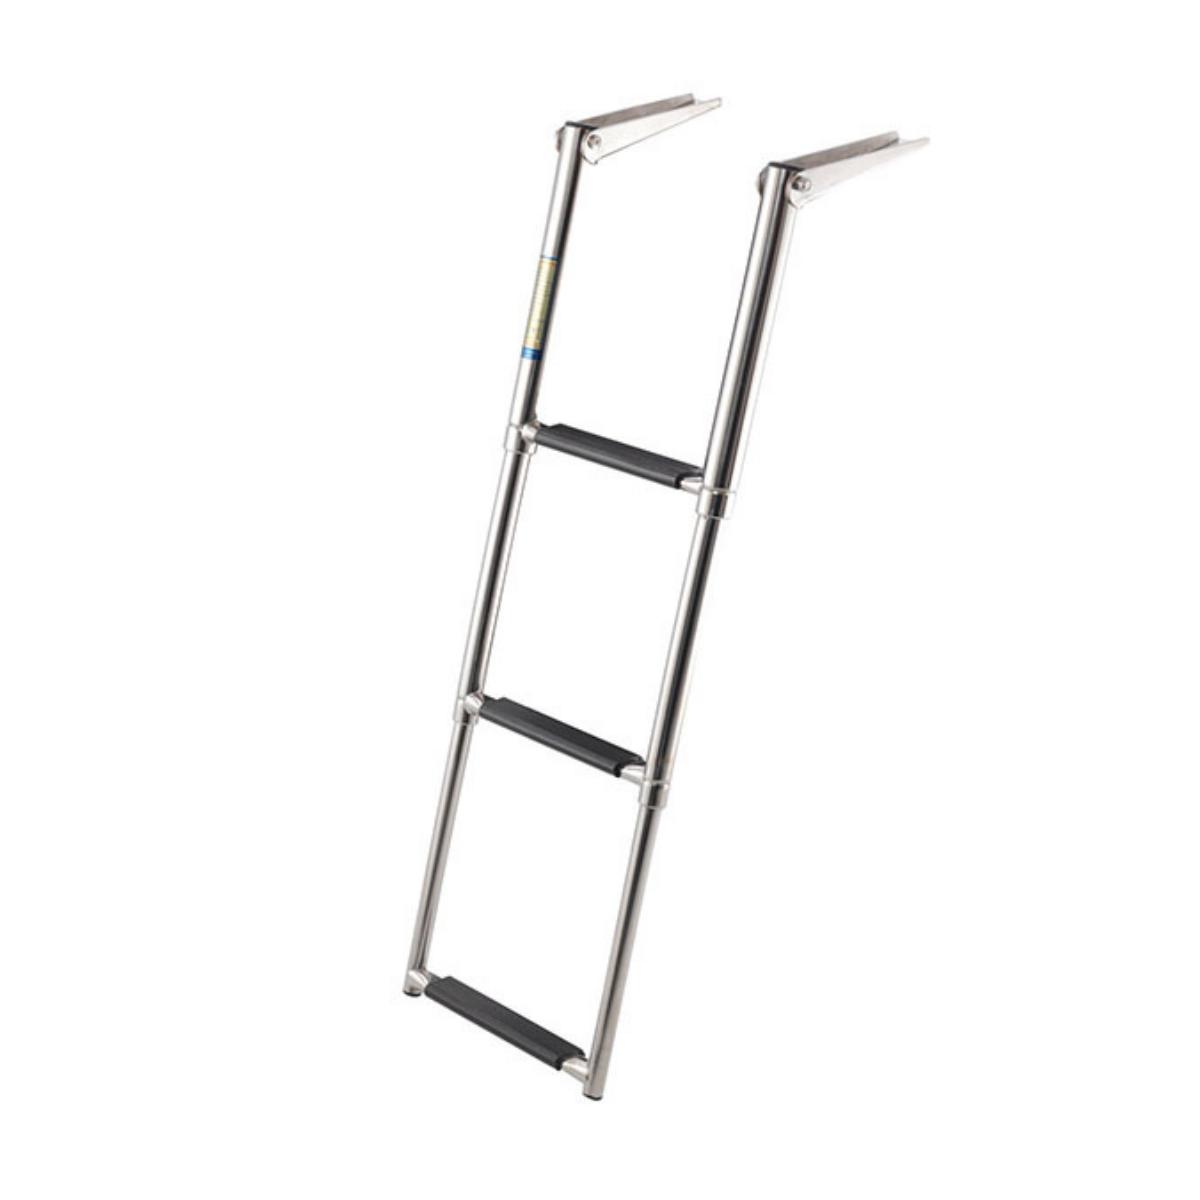 Escada Náutica Inox 3 Degraus Lanchas Barco